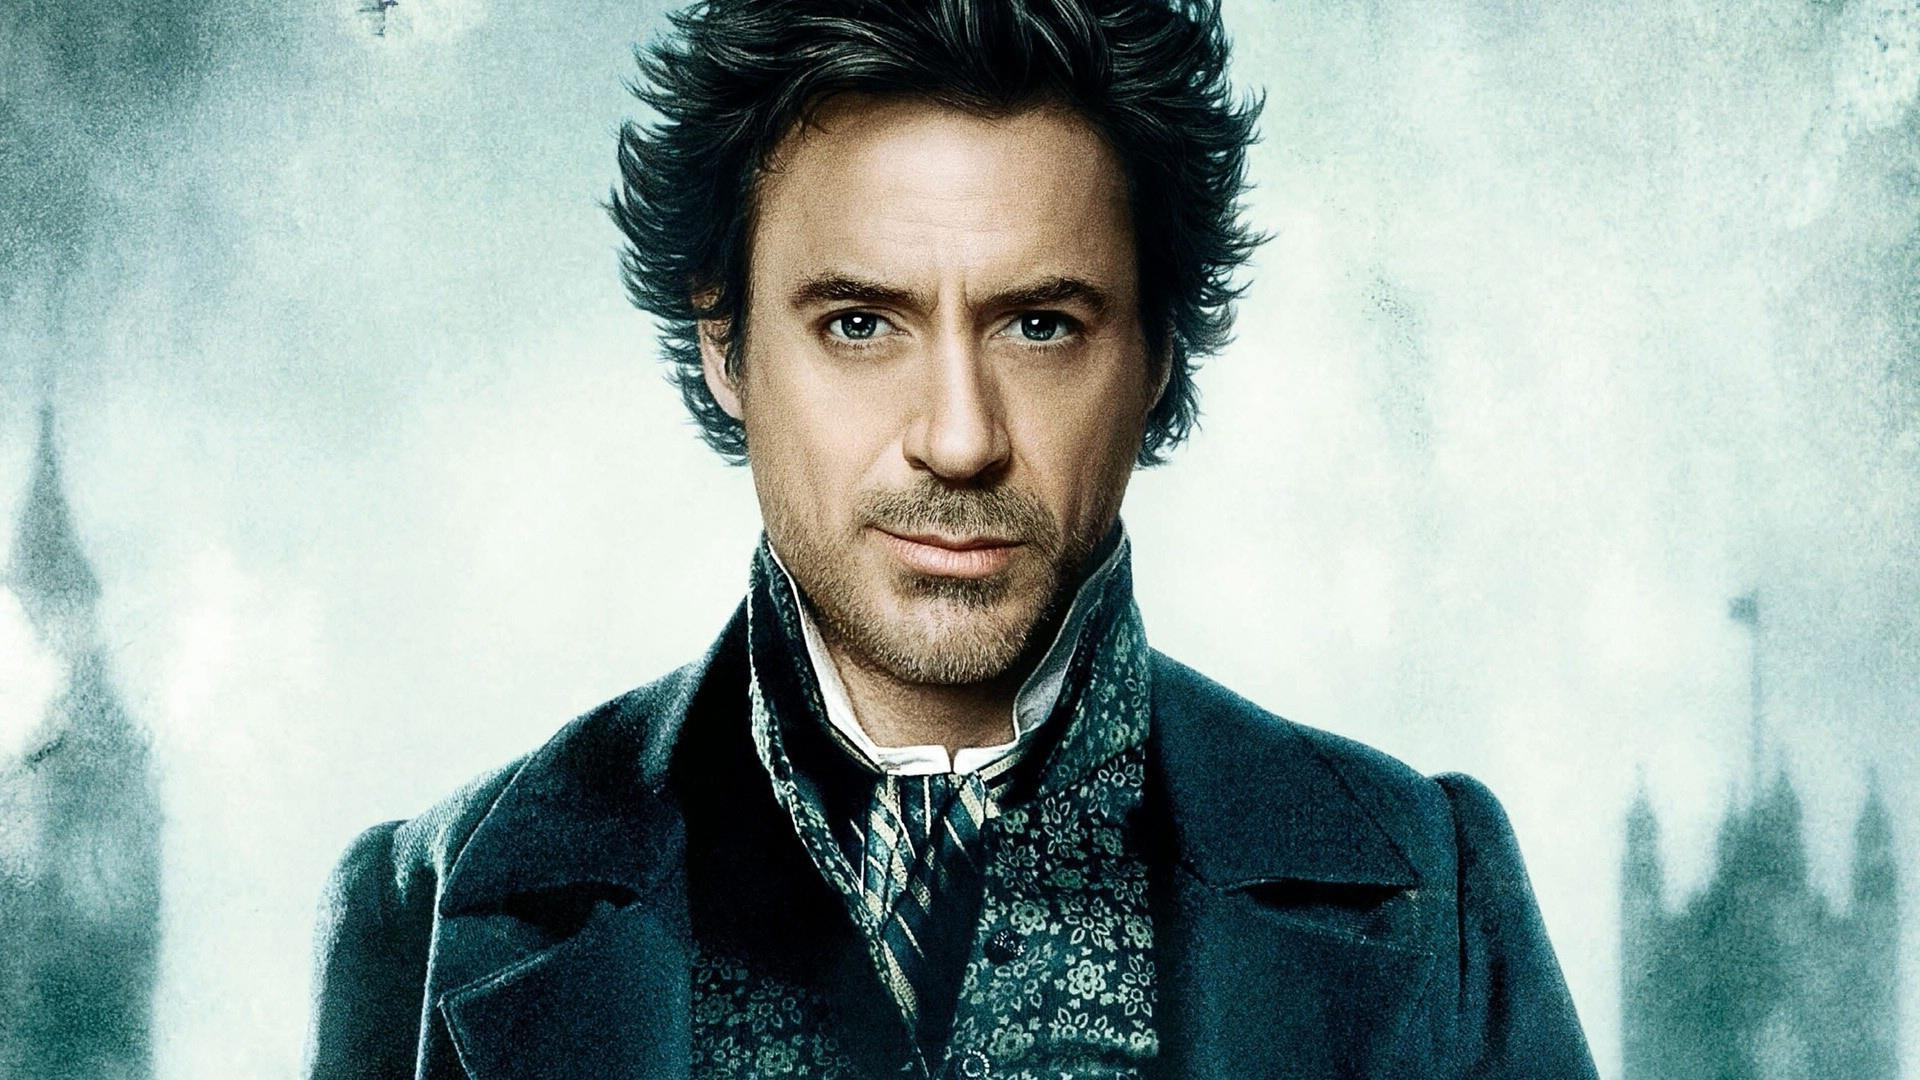 [70+] Robert Downey Jr Sherlock Holmes Wallpaper on ...